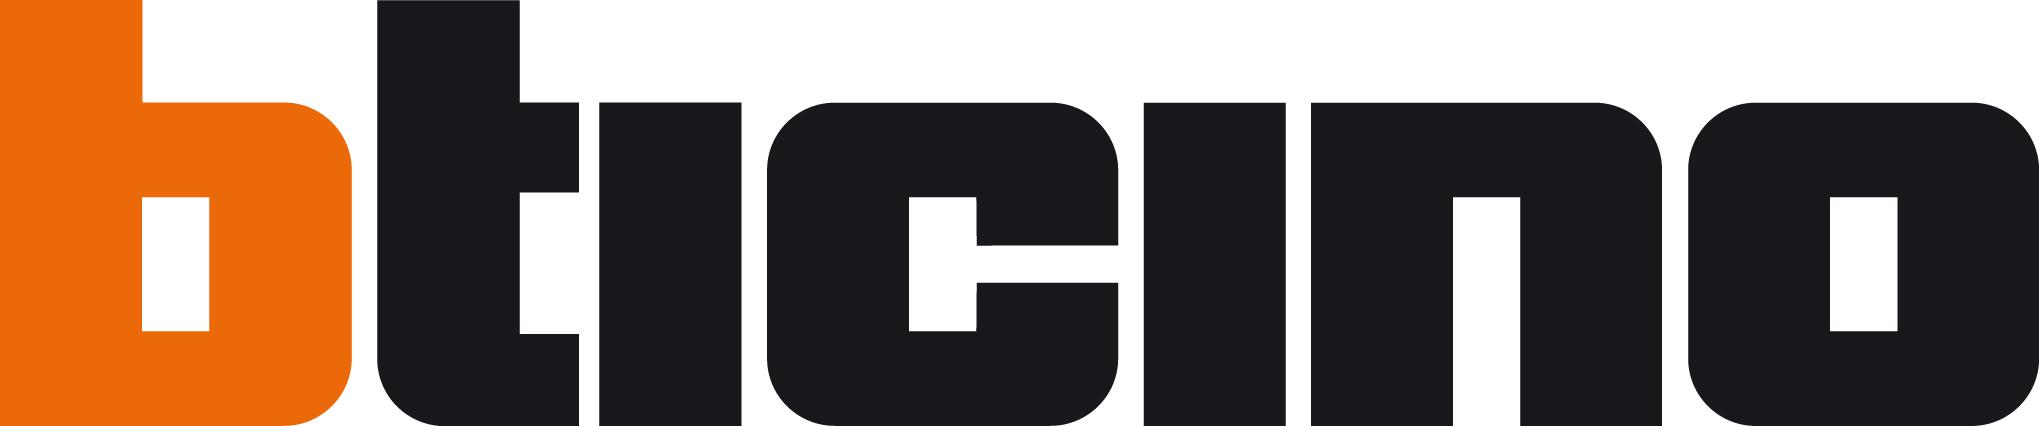 Cat Logos Tarifas Distel Telecomunicacionesdistel